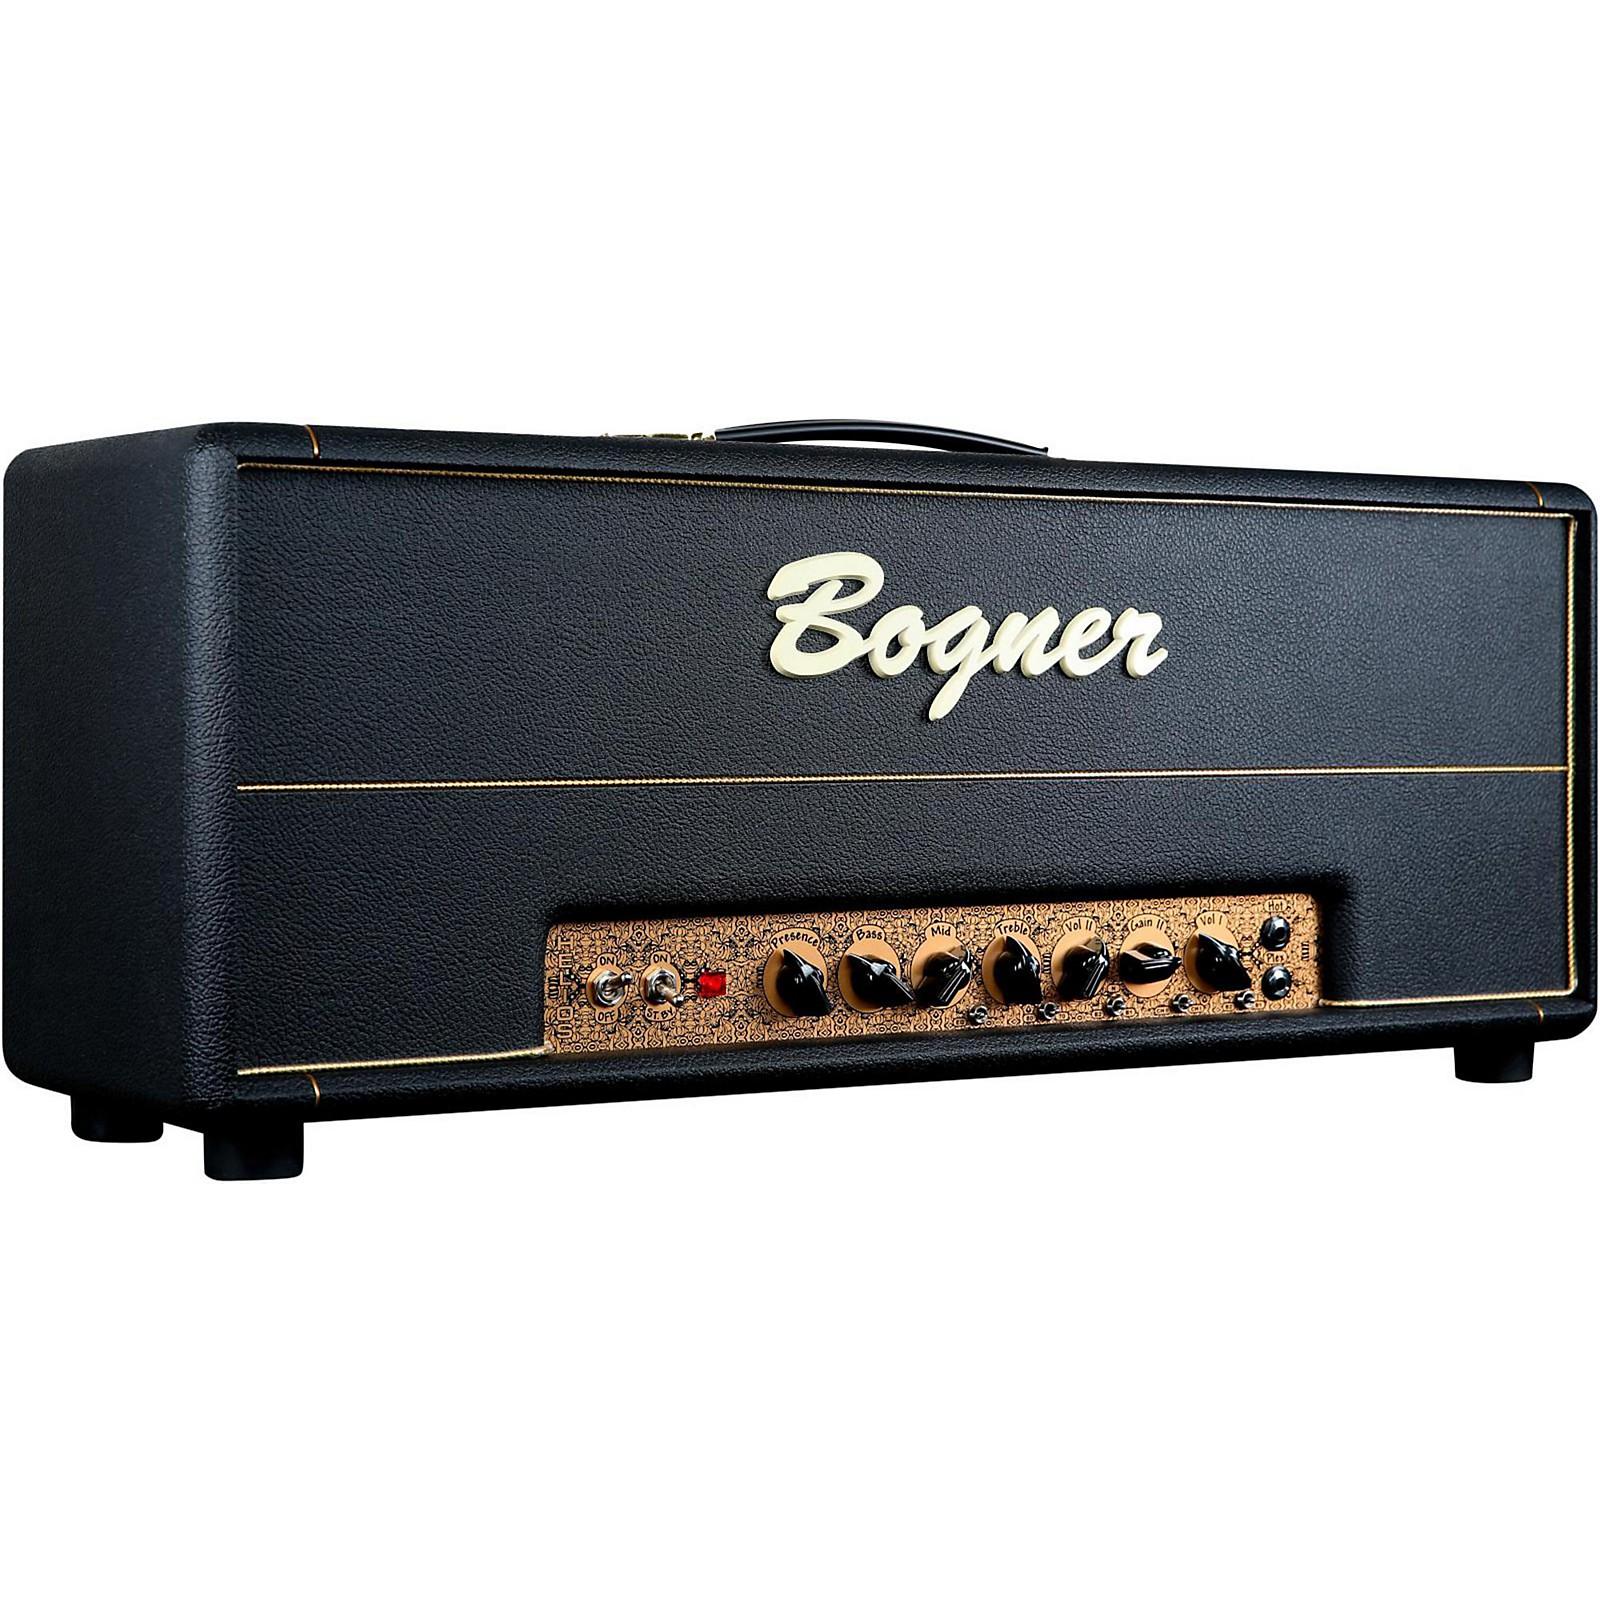 Bogner Helios 100W Tube Guitar Amp Head